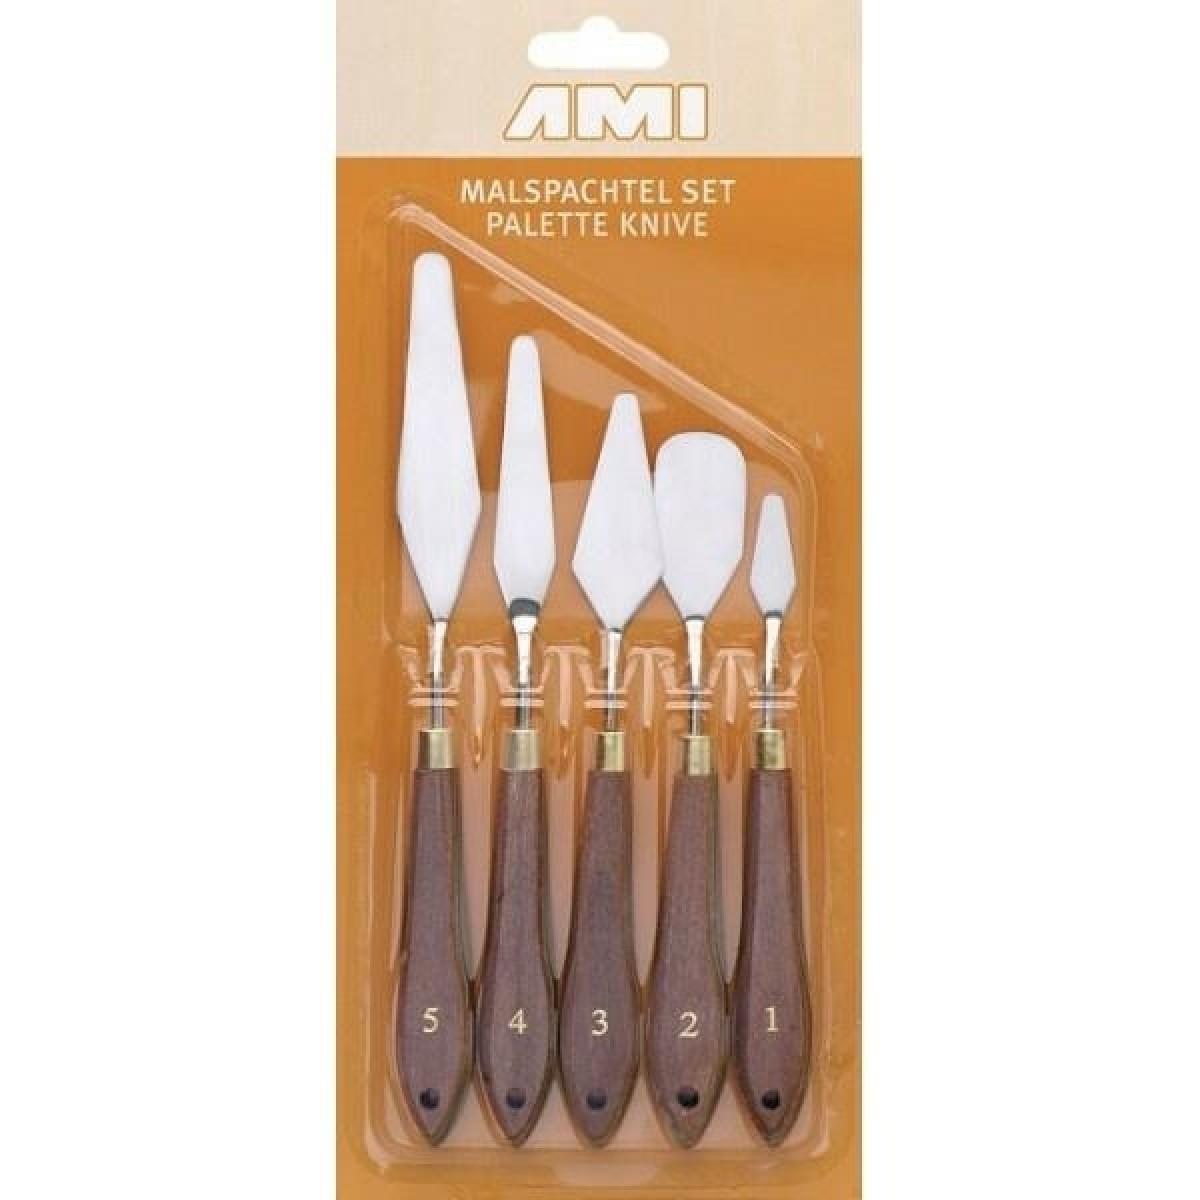 Paletknive sæt, 5 stk. no. 1 - 5